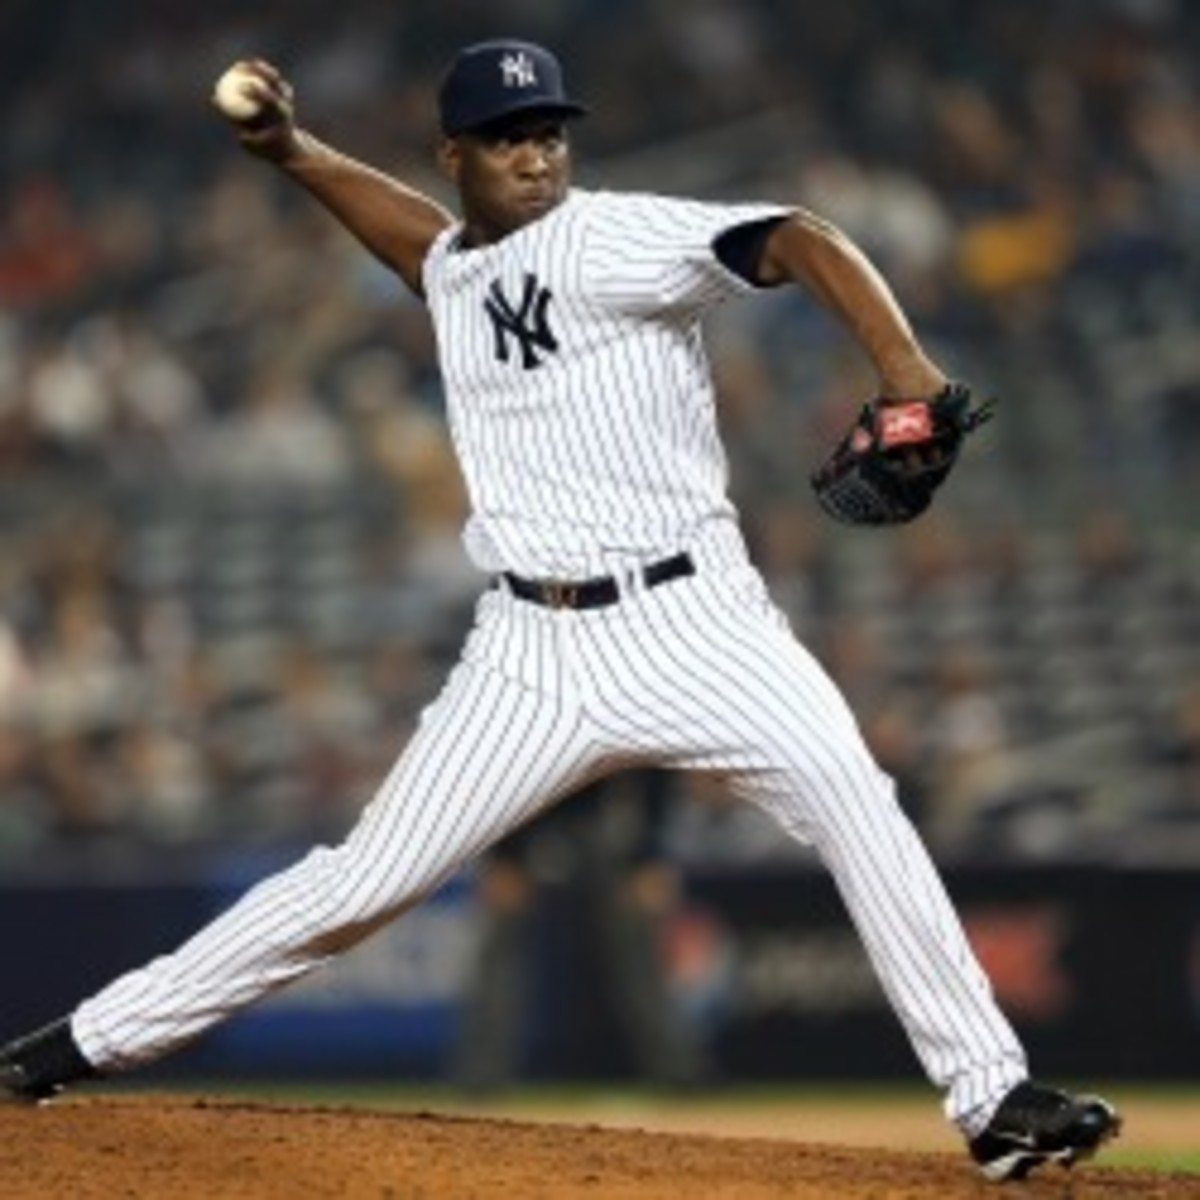 on October 2, 2012 at Yankee Stadium in the Bronx borough of New York City.